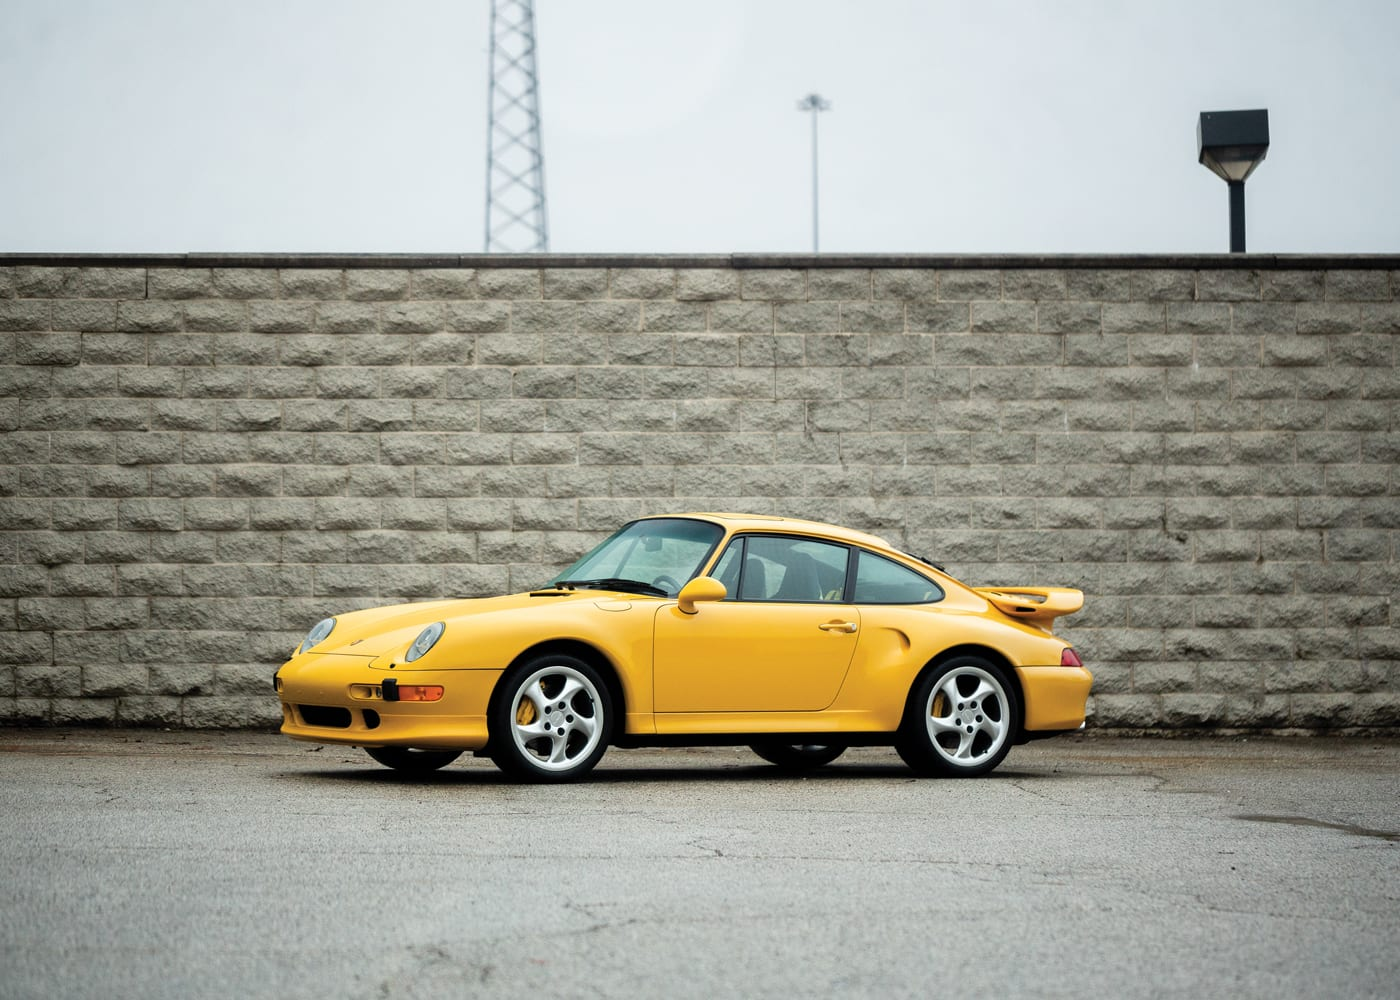 1997 Porsche 911 Turbo S With 88 Original Miles Heading To Auction